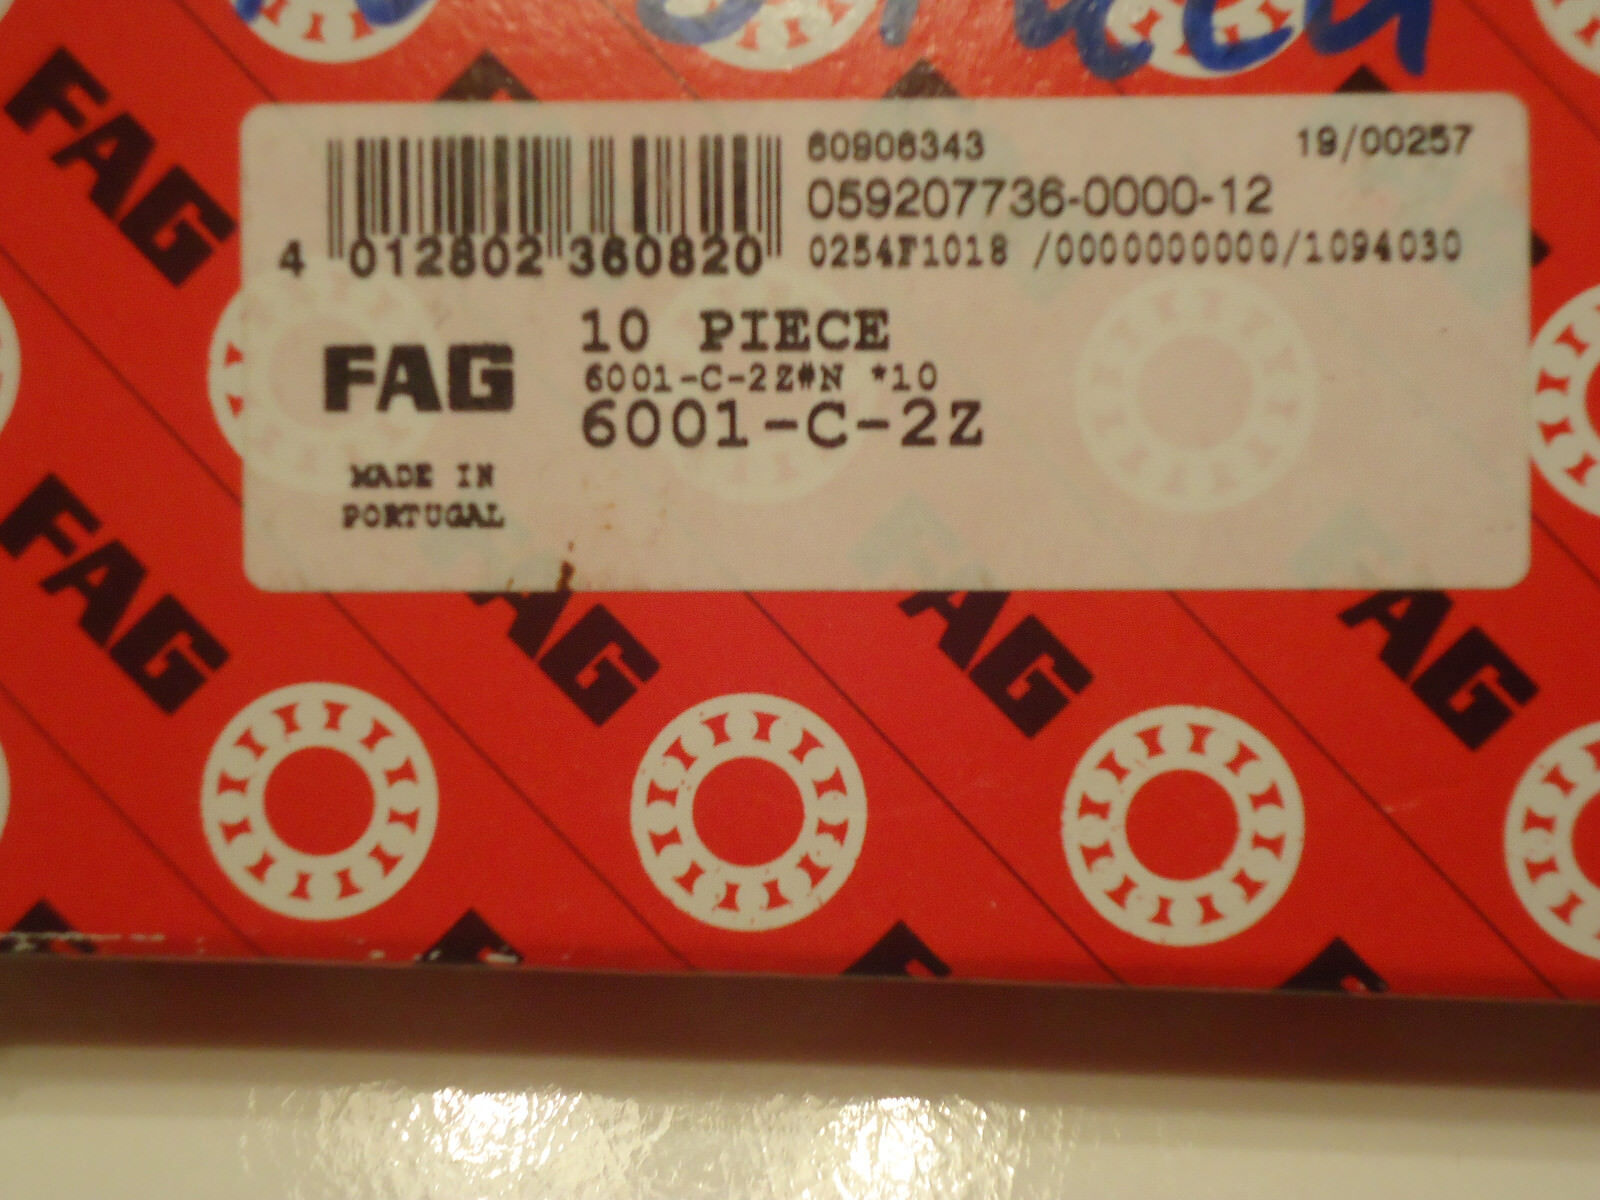 Markenware SKF 6 Kugellager 6001 ZZ 2Z 12 x 28 x 8 mm